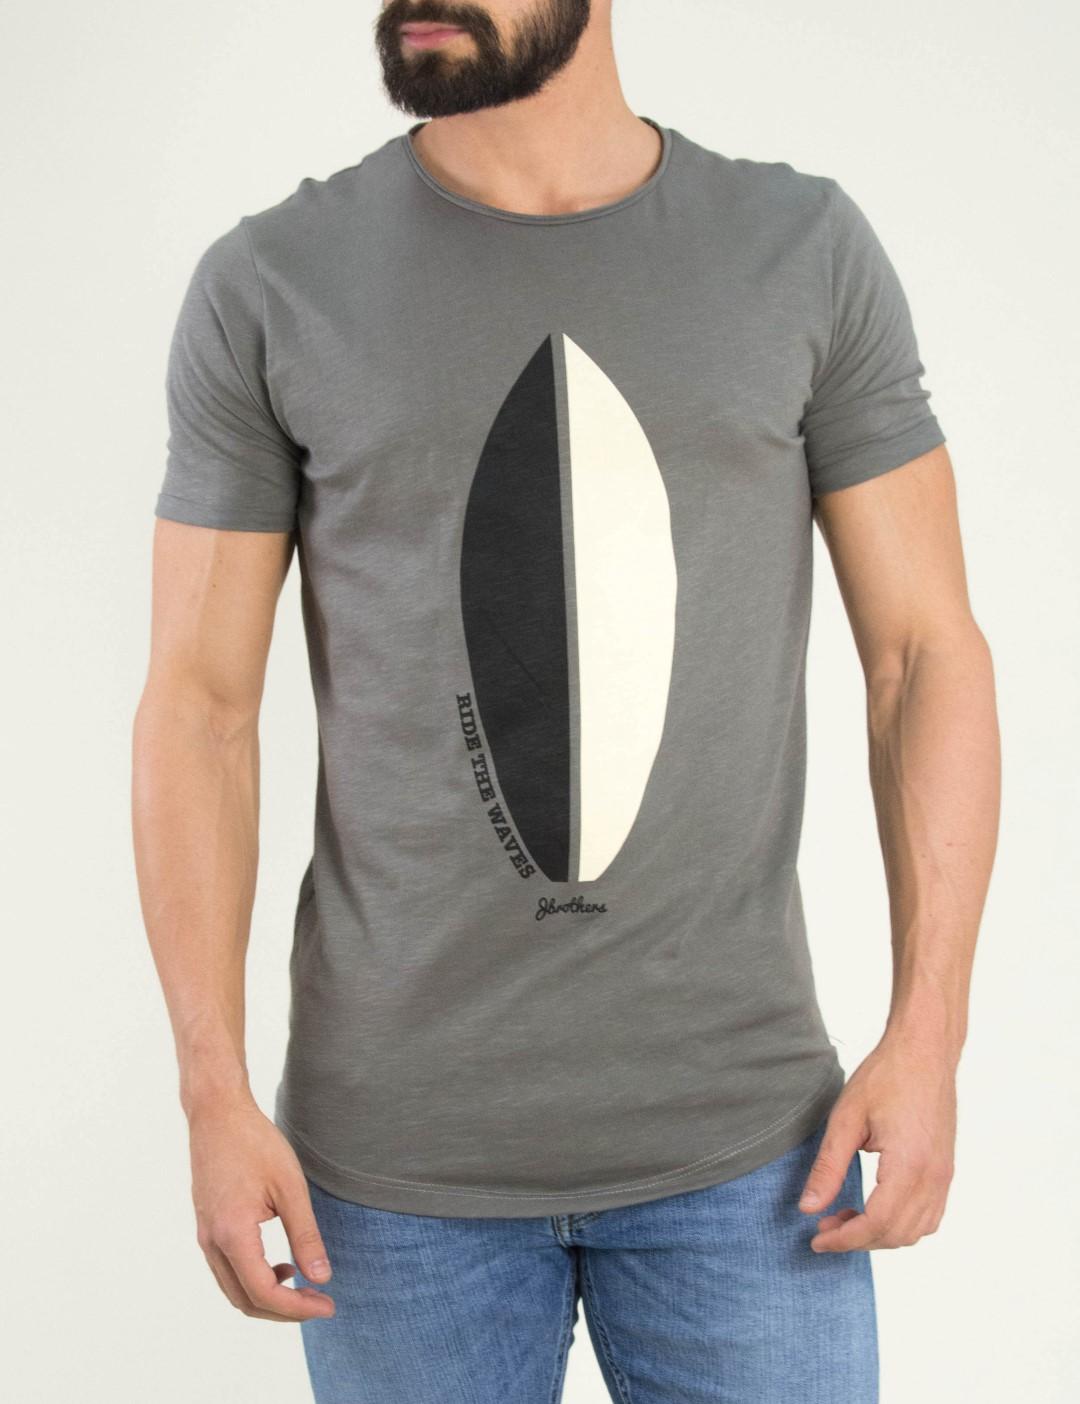 370bcc59298 T-Shirts, Ανδρικές Μπλούζες, Ανδρικά Ρούχα